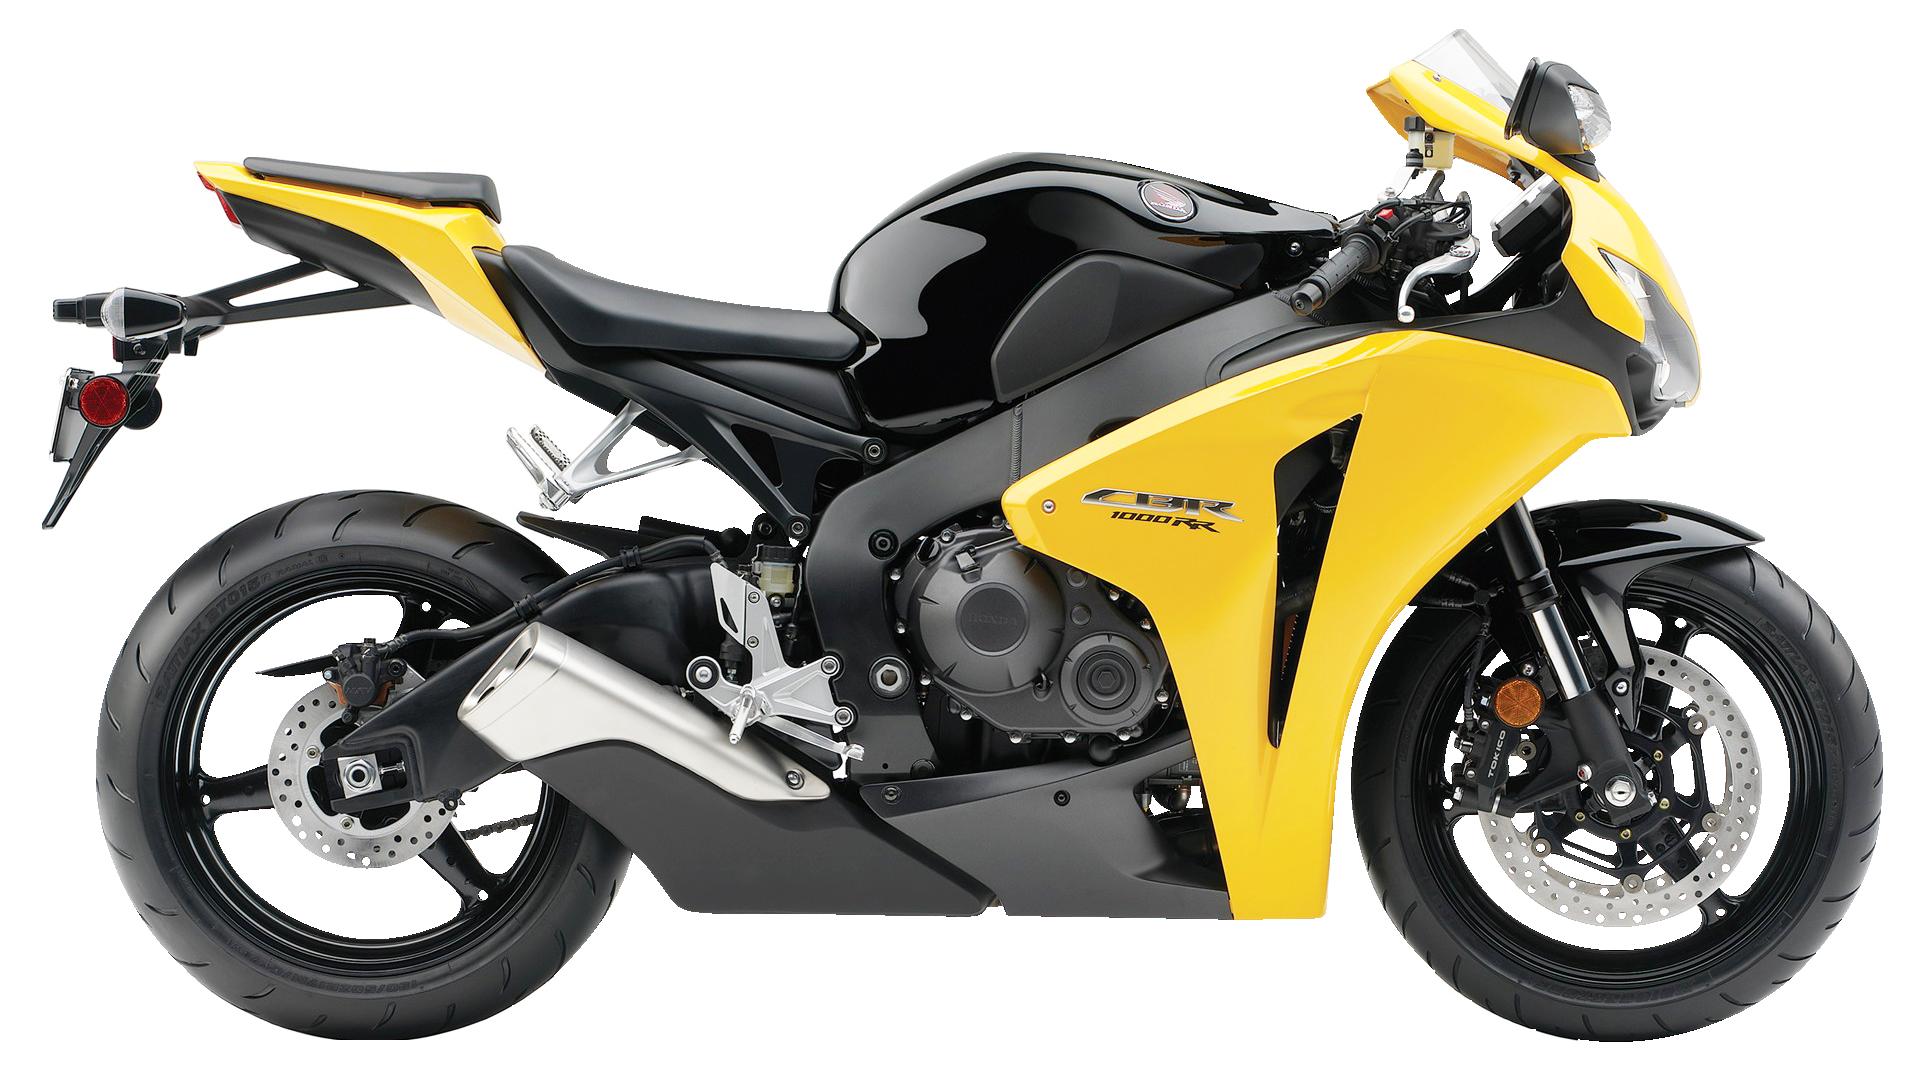 Honda CBR 1000RR PNG Image